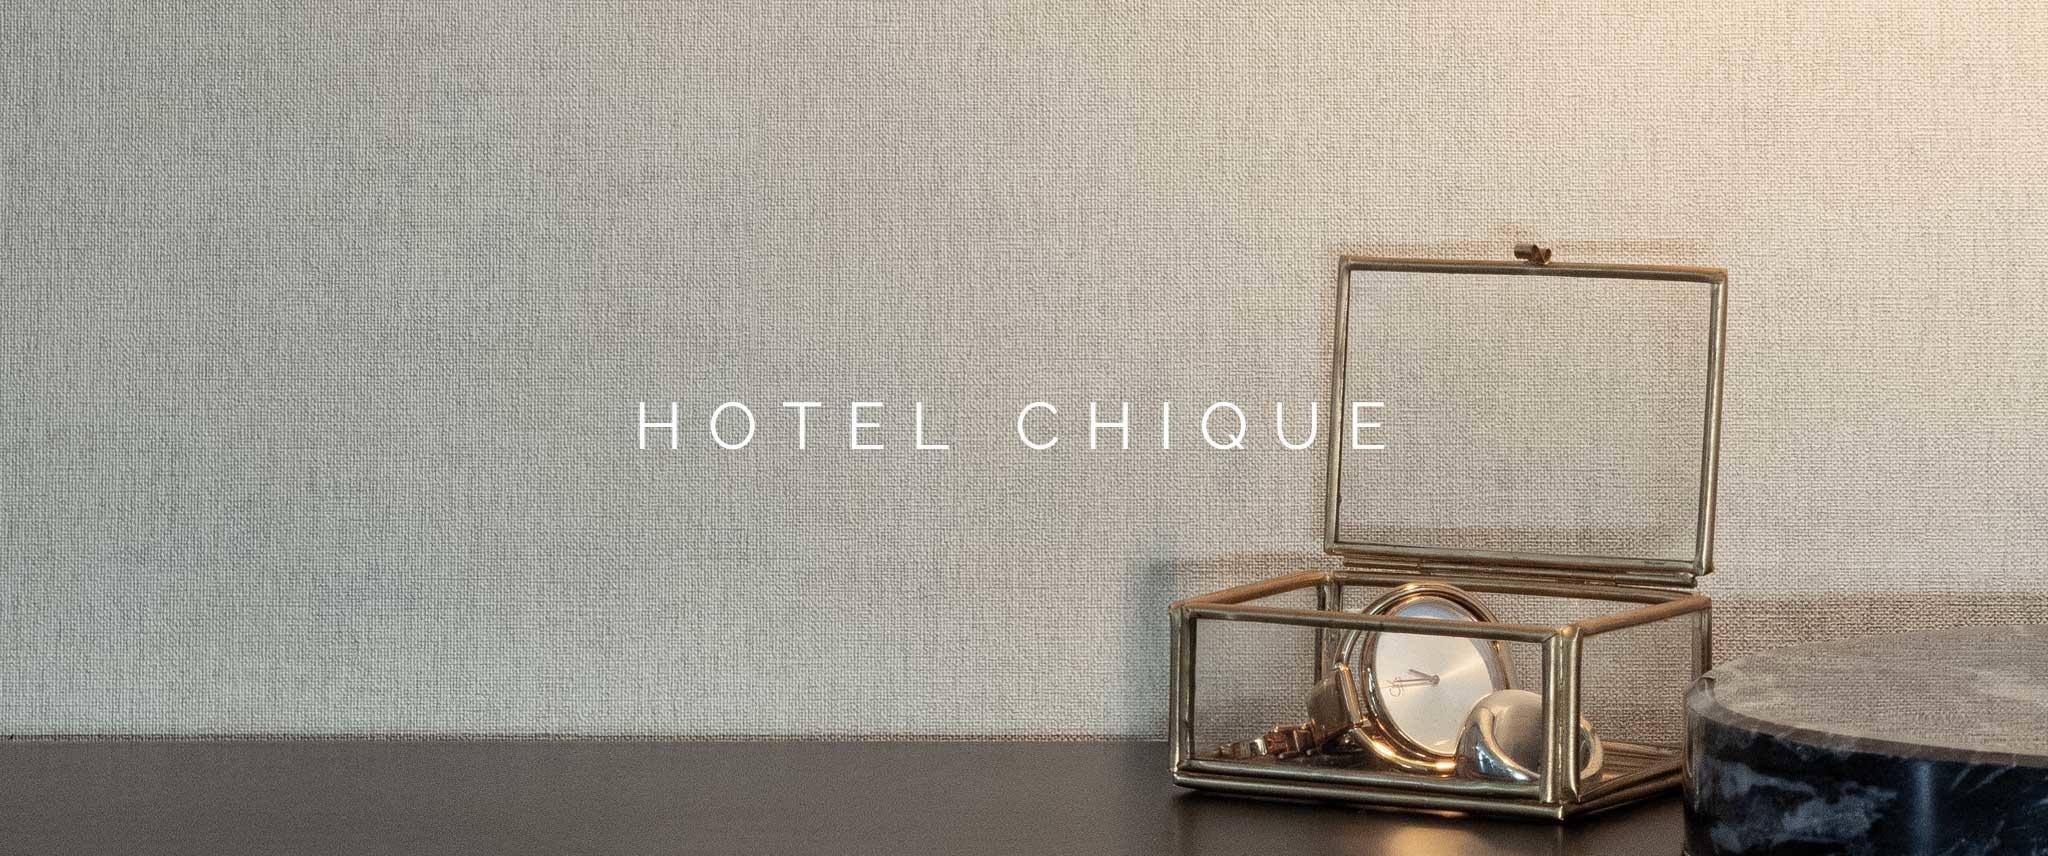 Behang Hotel Chique